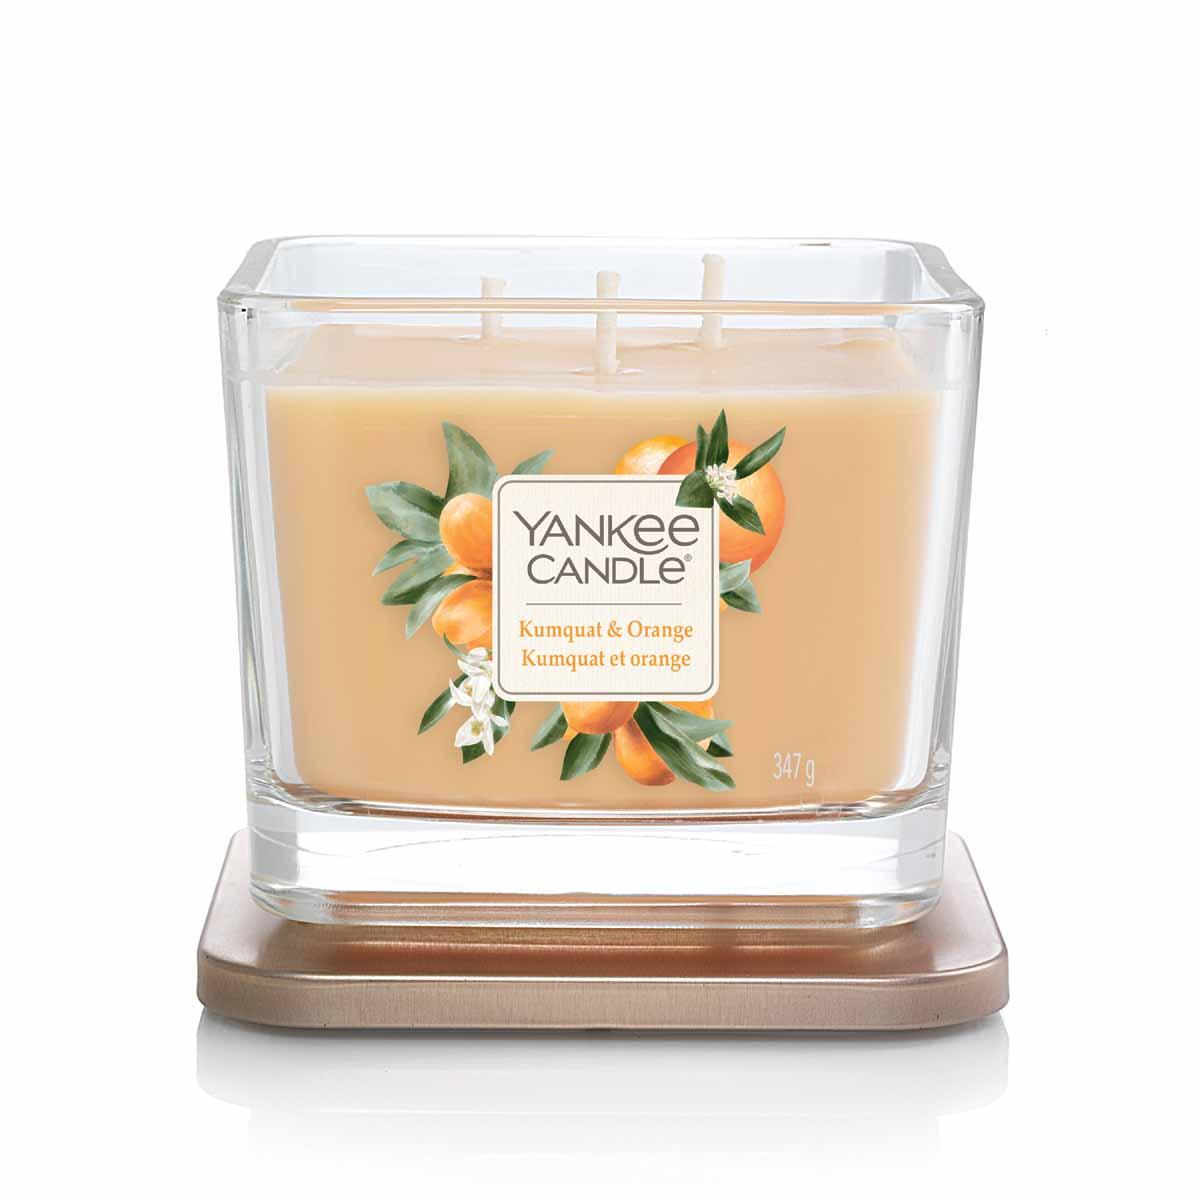 Yankee Candle Kumquat & Orange Square Vessel Media